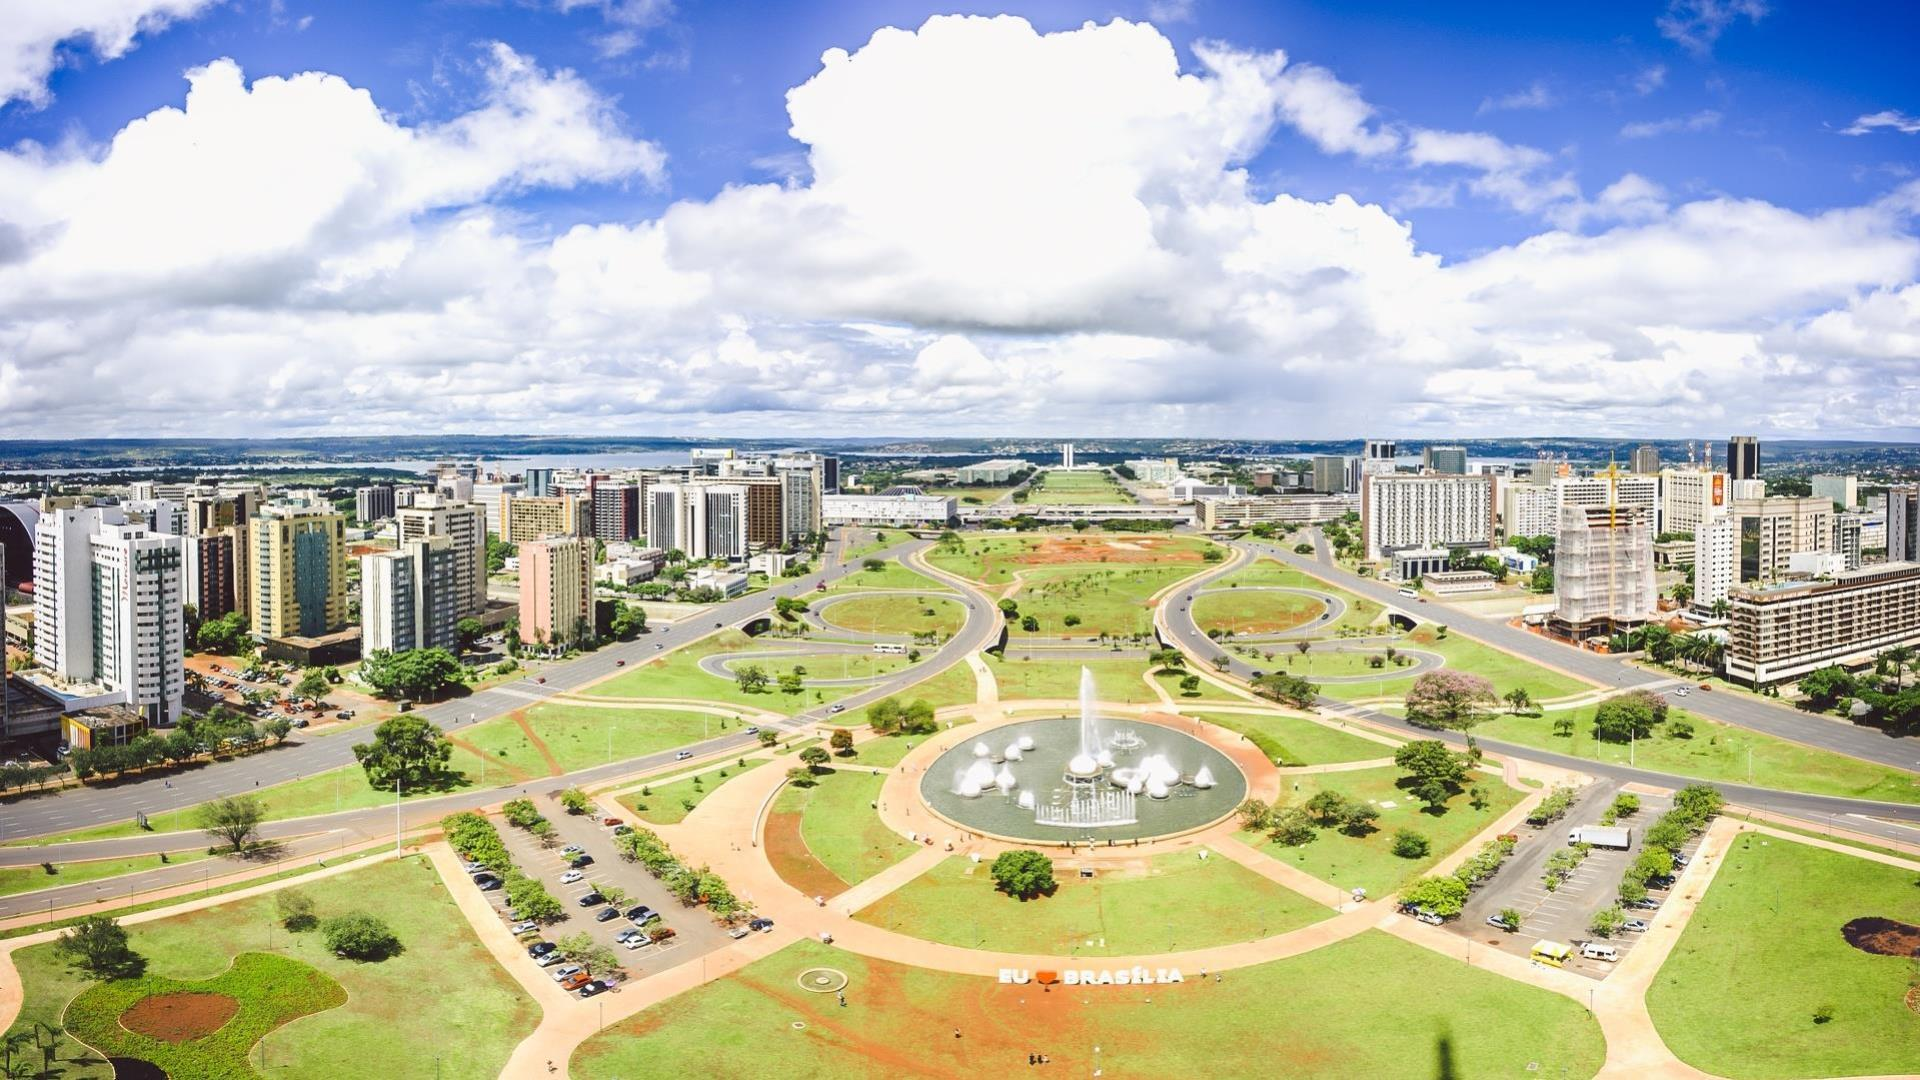 Brasilien Brasilia: 3 Tage Reisebaustein - Brasilia klassisch erleben